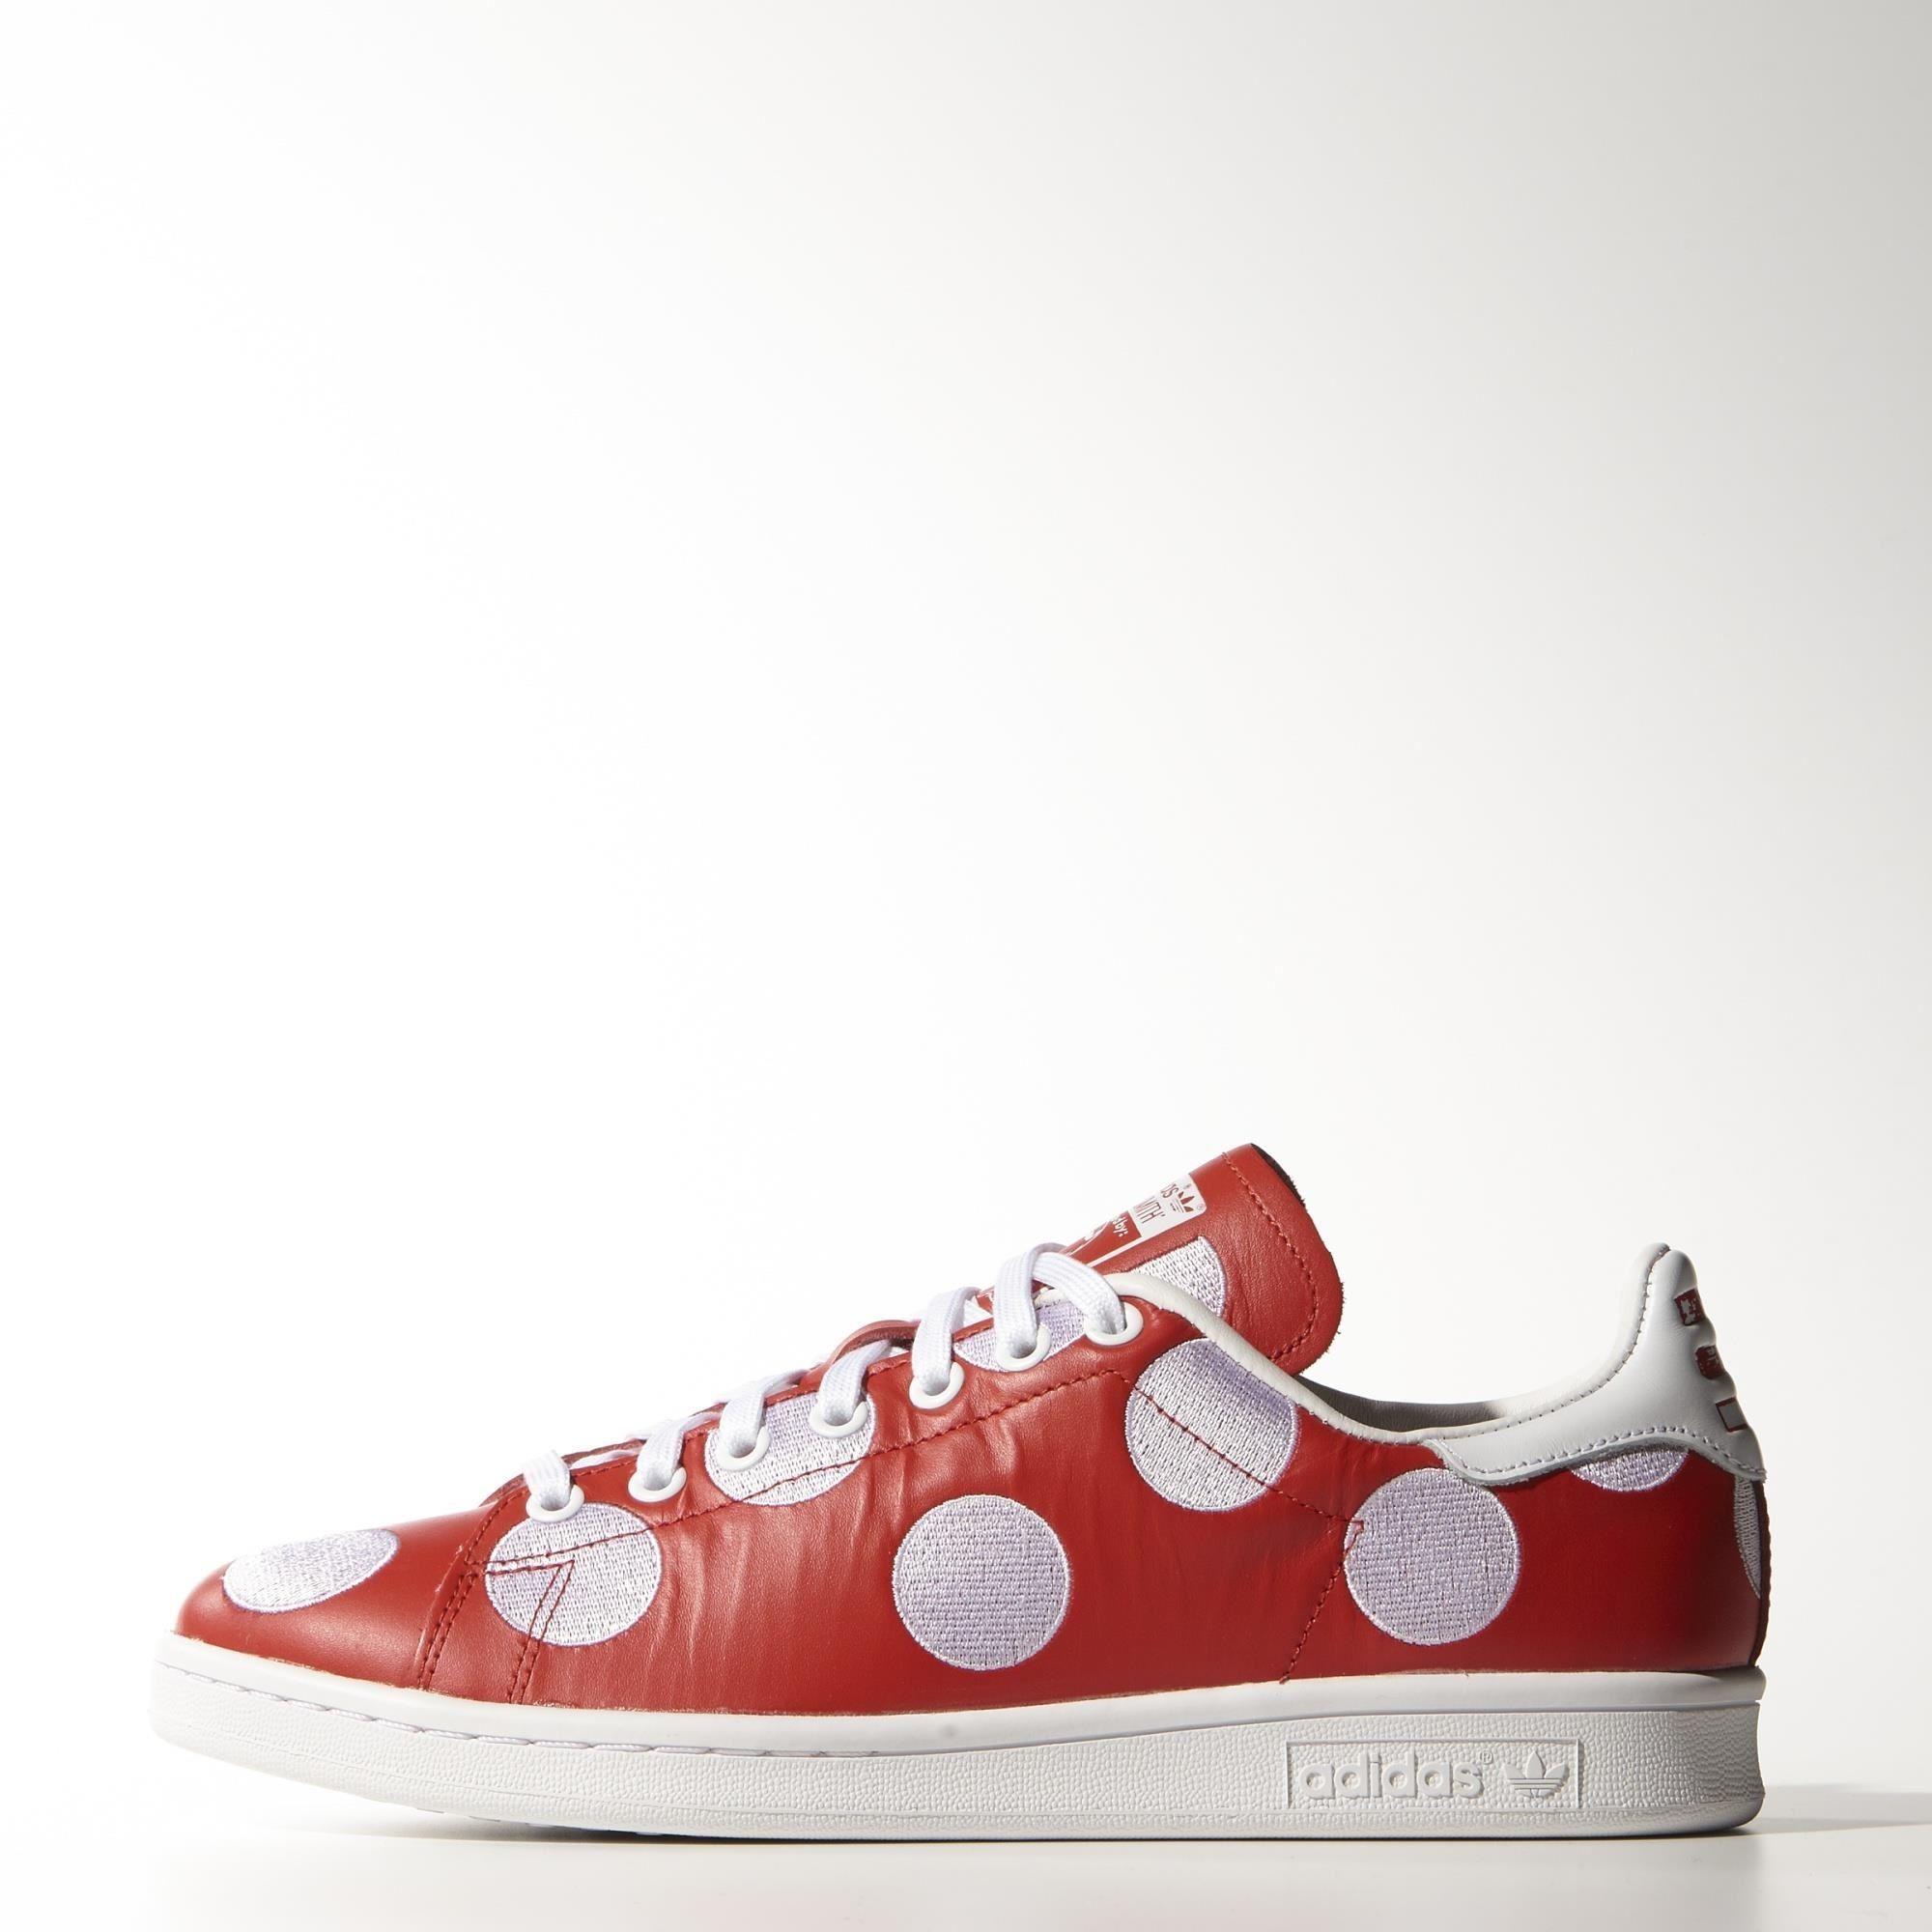 adidas big polka dot shoes